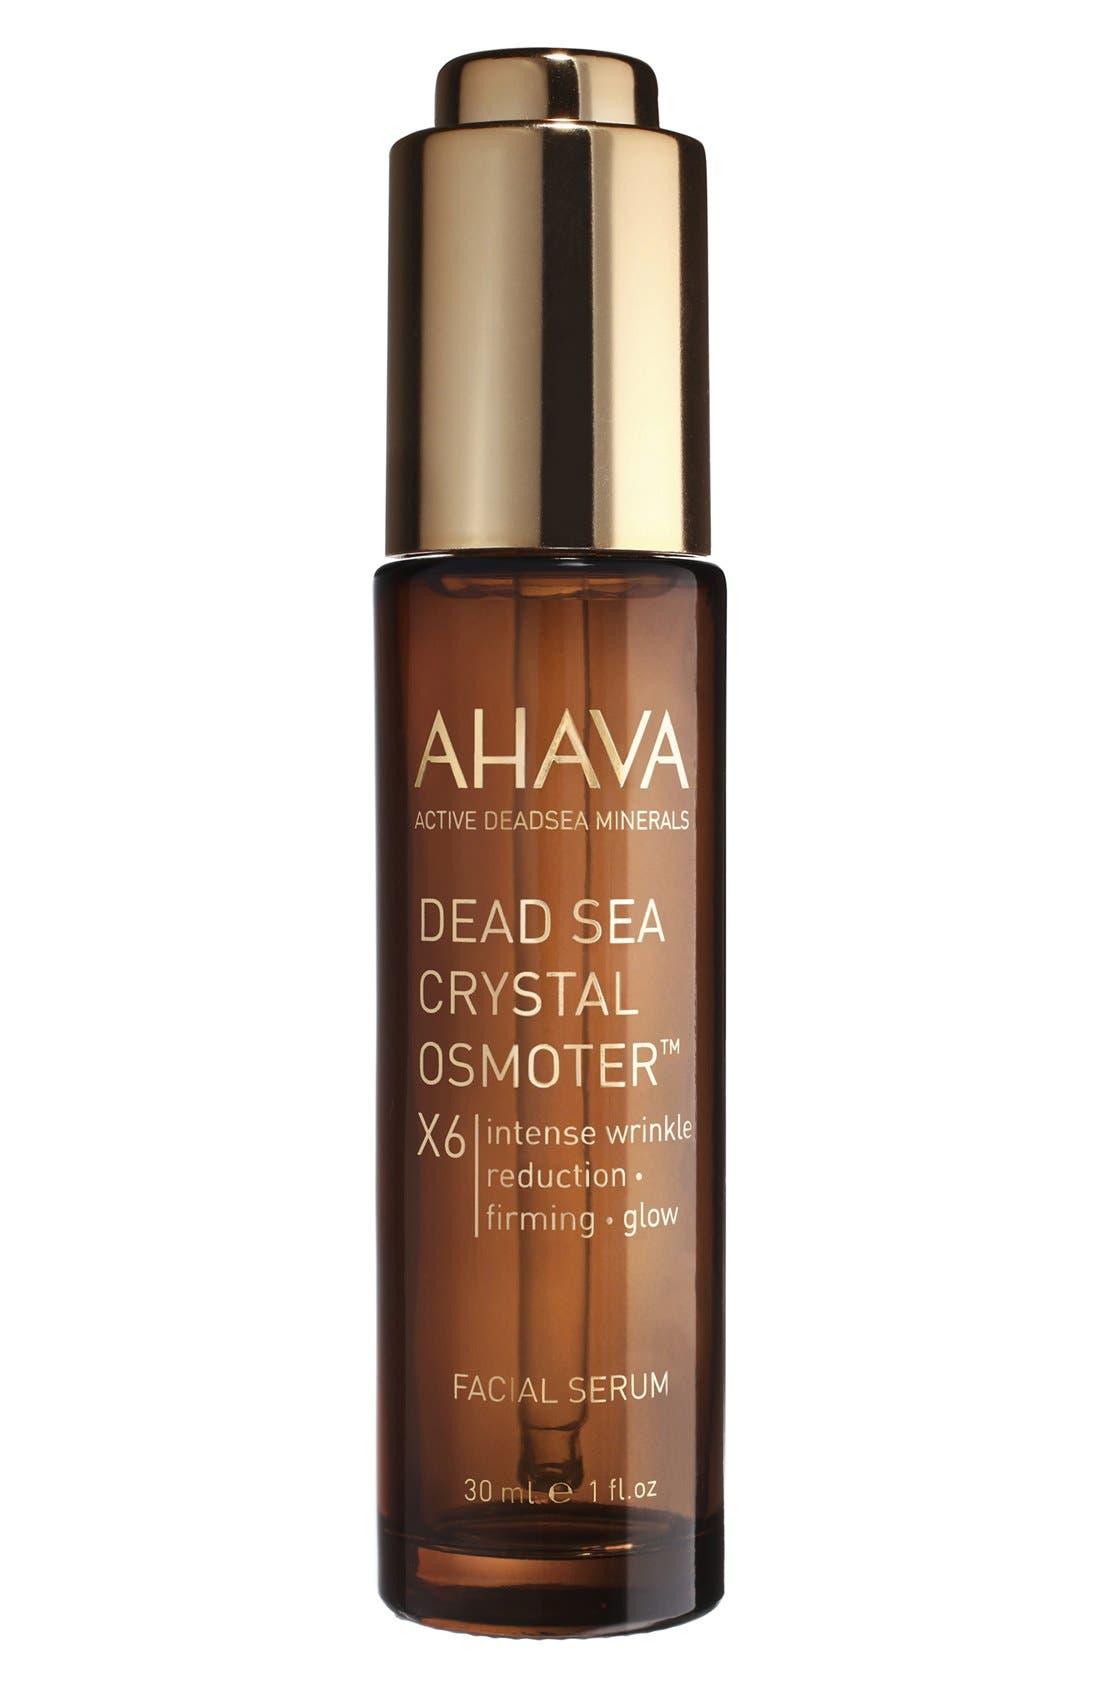 AHAVA 'Dead Sea Crystal Osmoter X6' Facial Serum